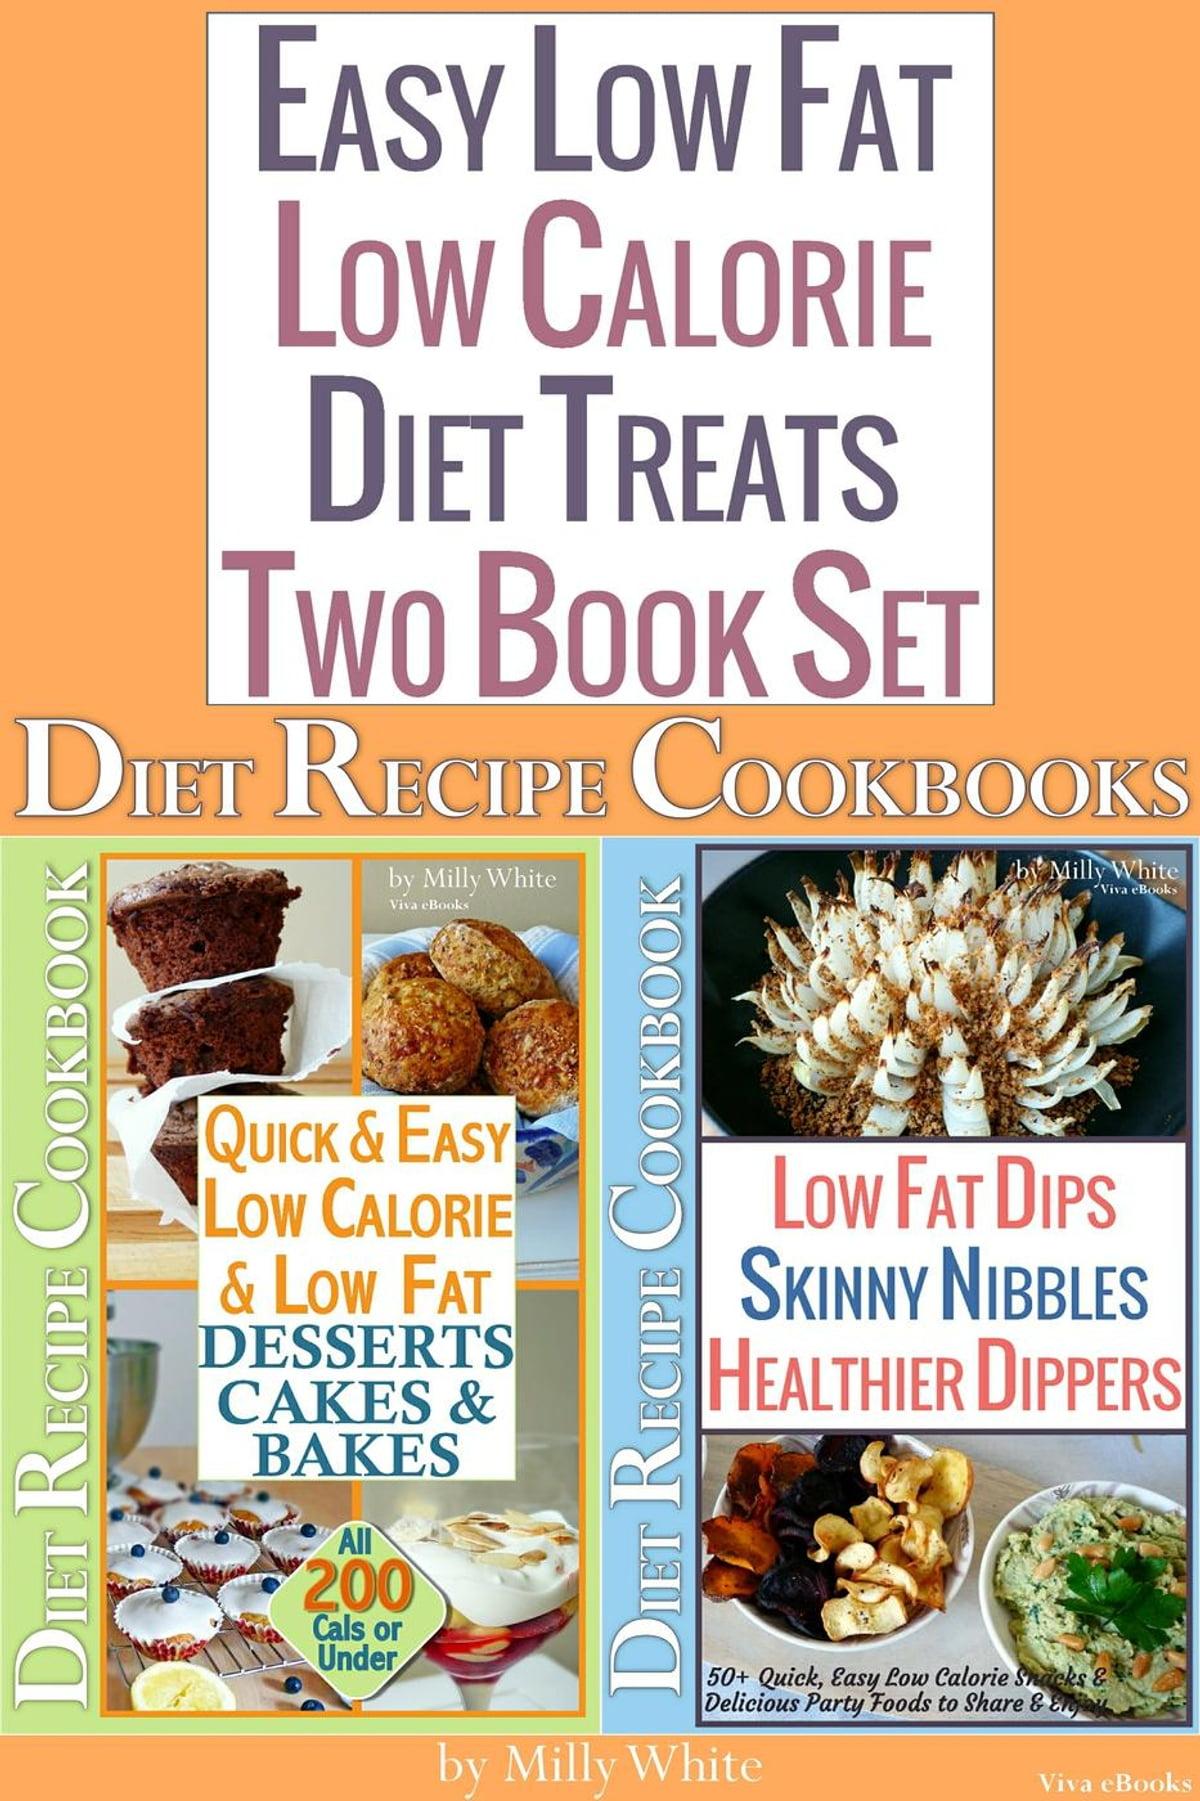 Easy Low Fat Low Caloriet Treats 2 Book Sett